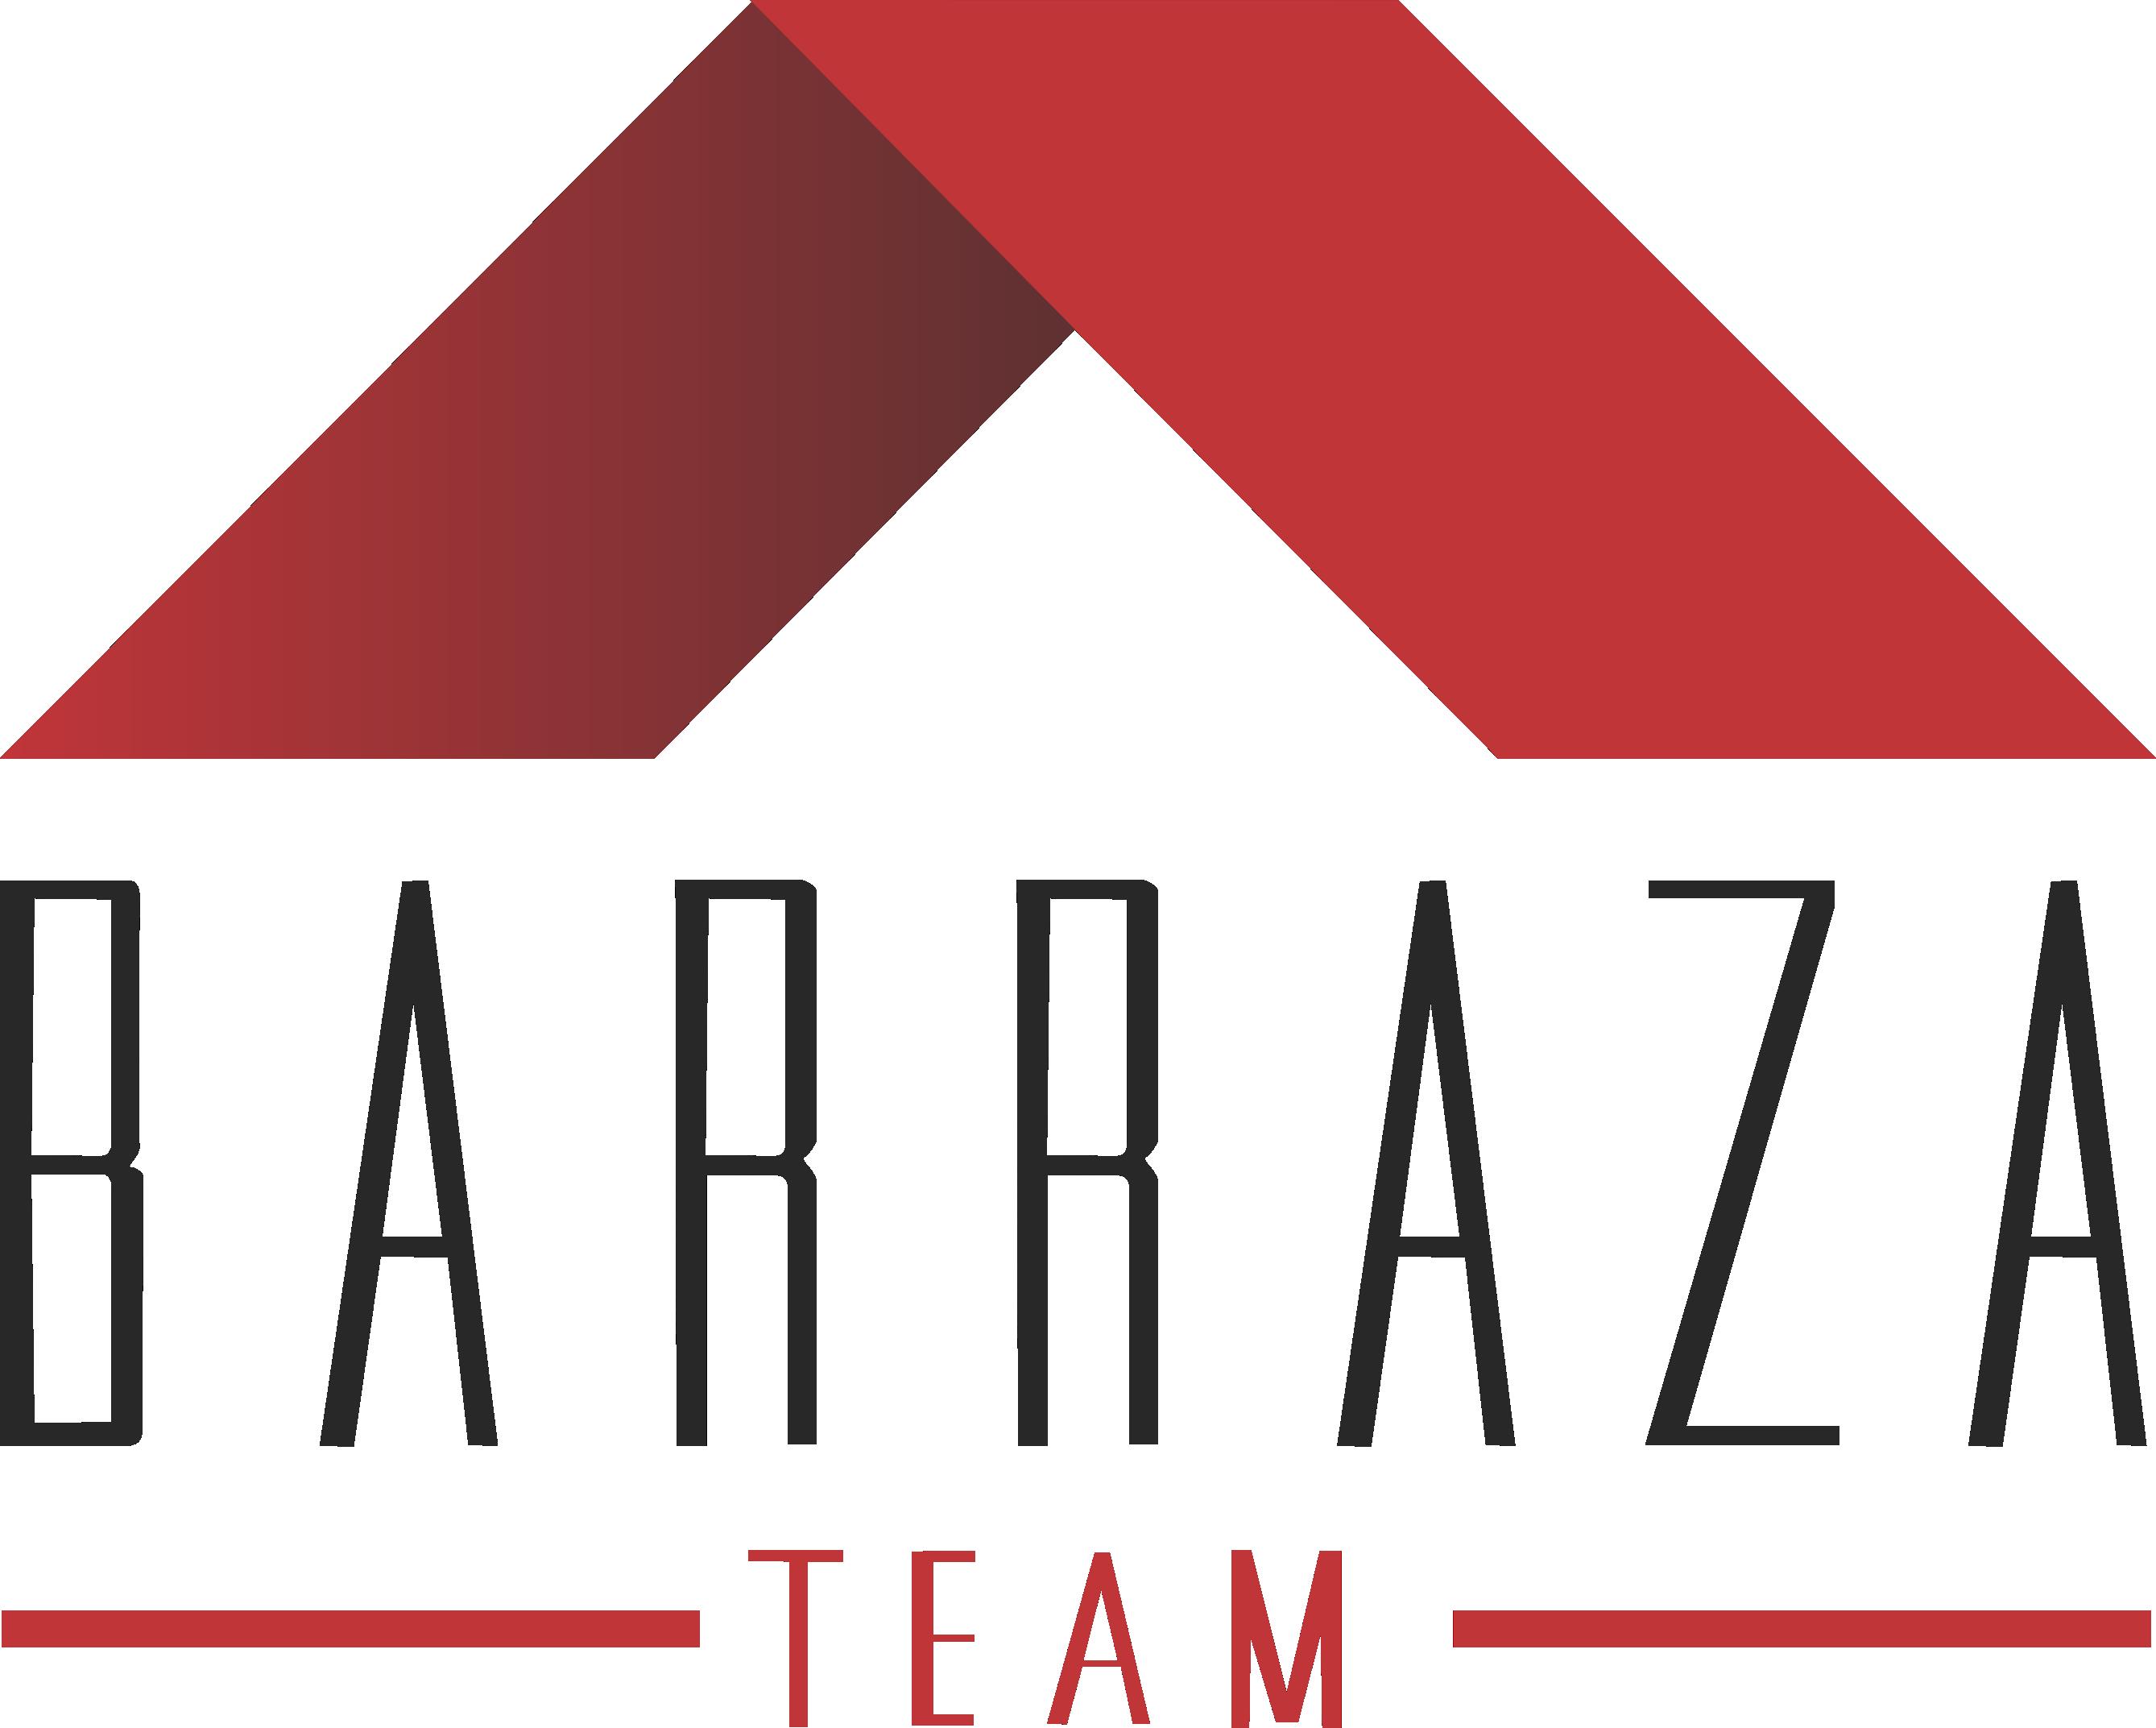 Barraza Team